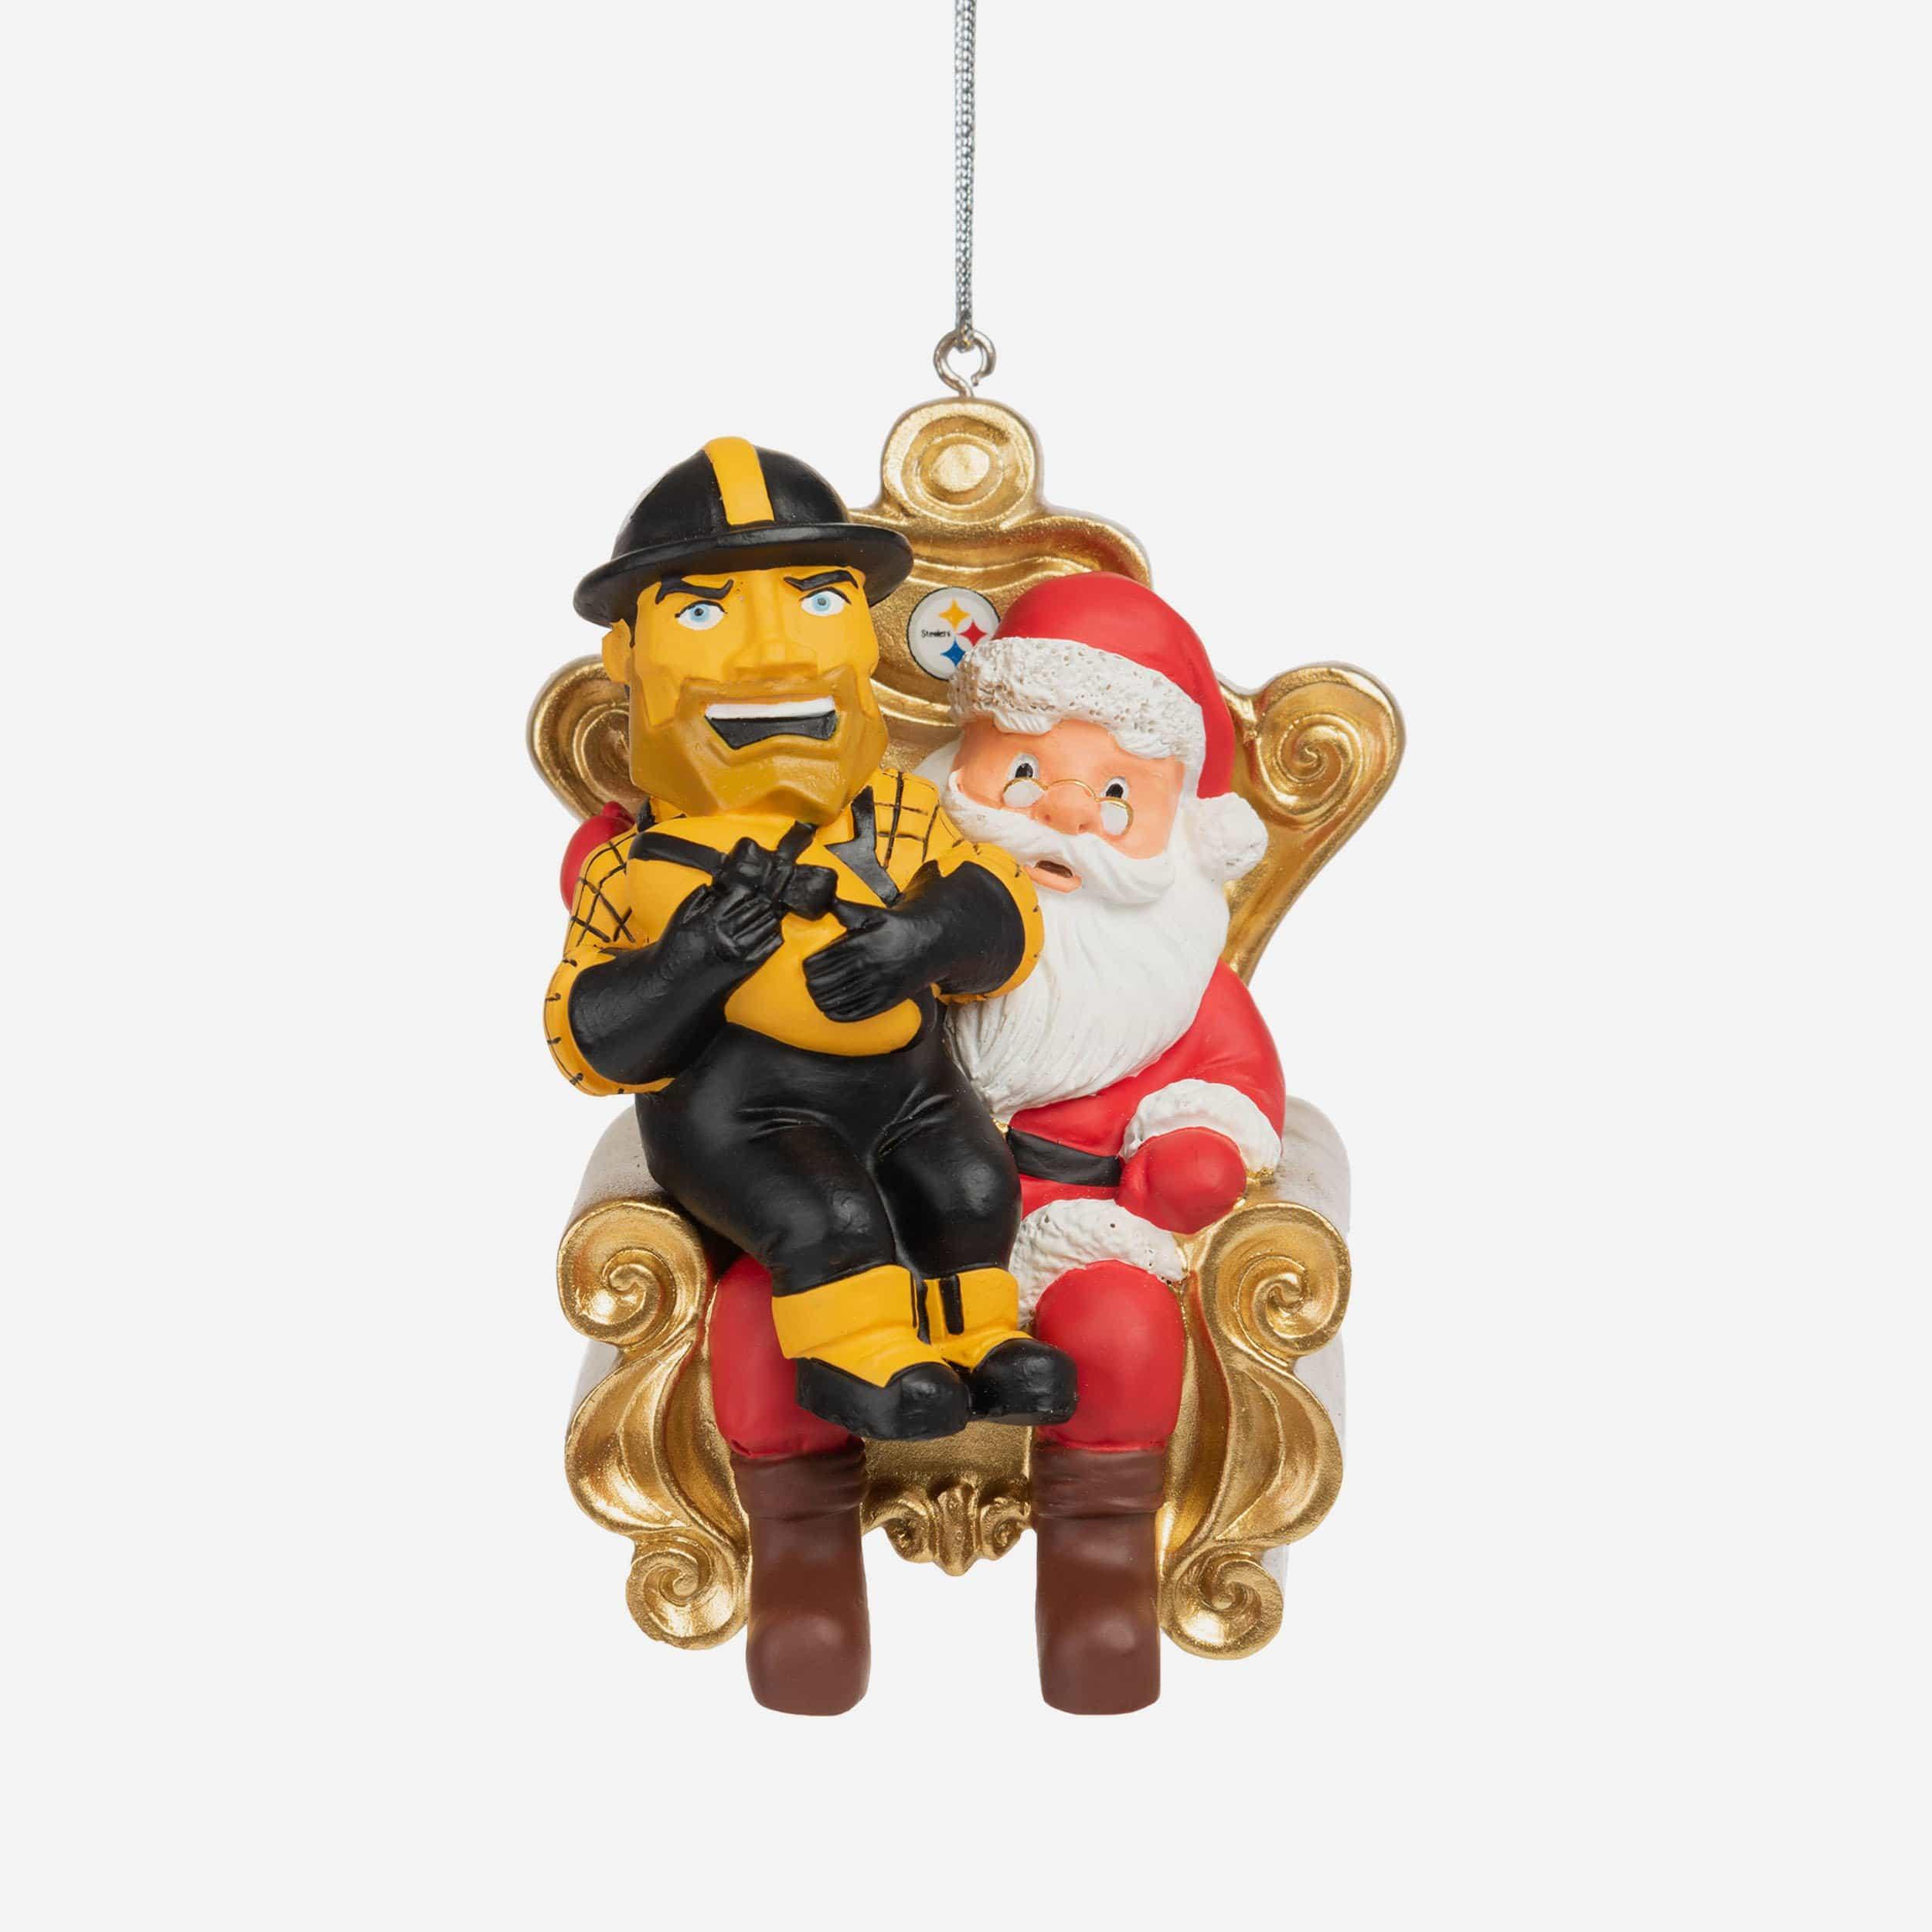 FOCO Steely McBeam Pittsburgh Steelers Mascot On Santa's Lap Ornament